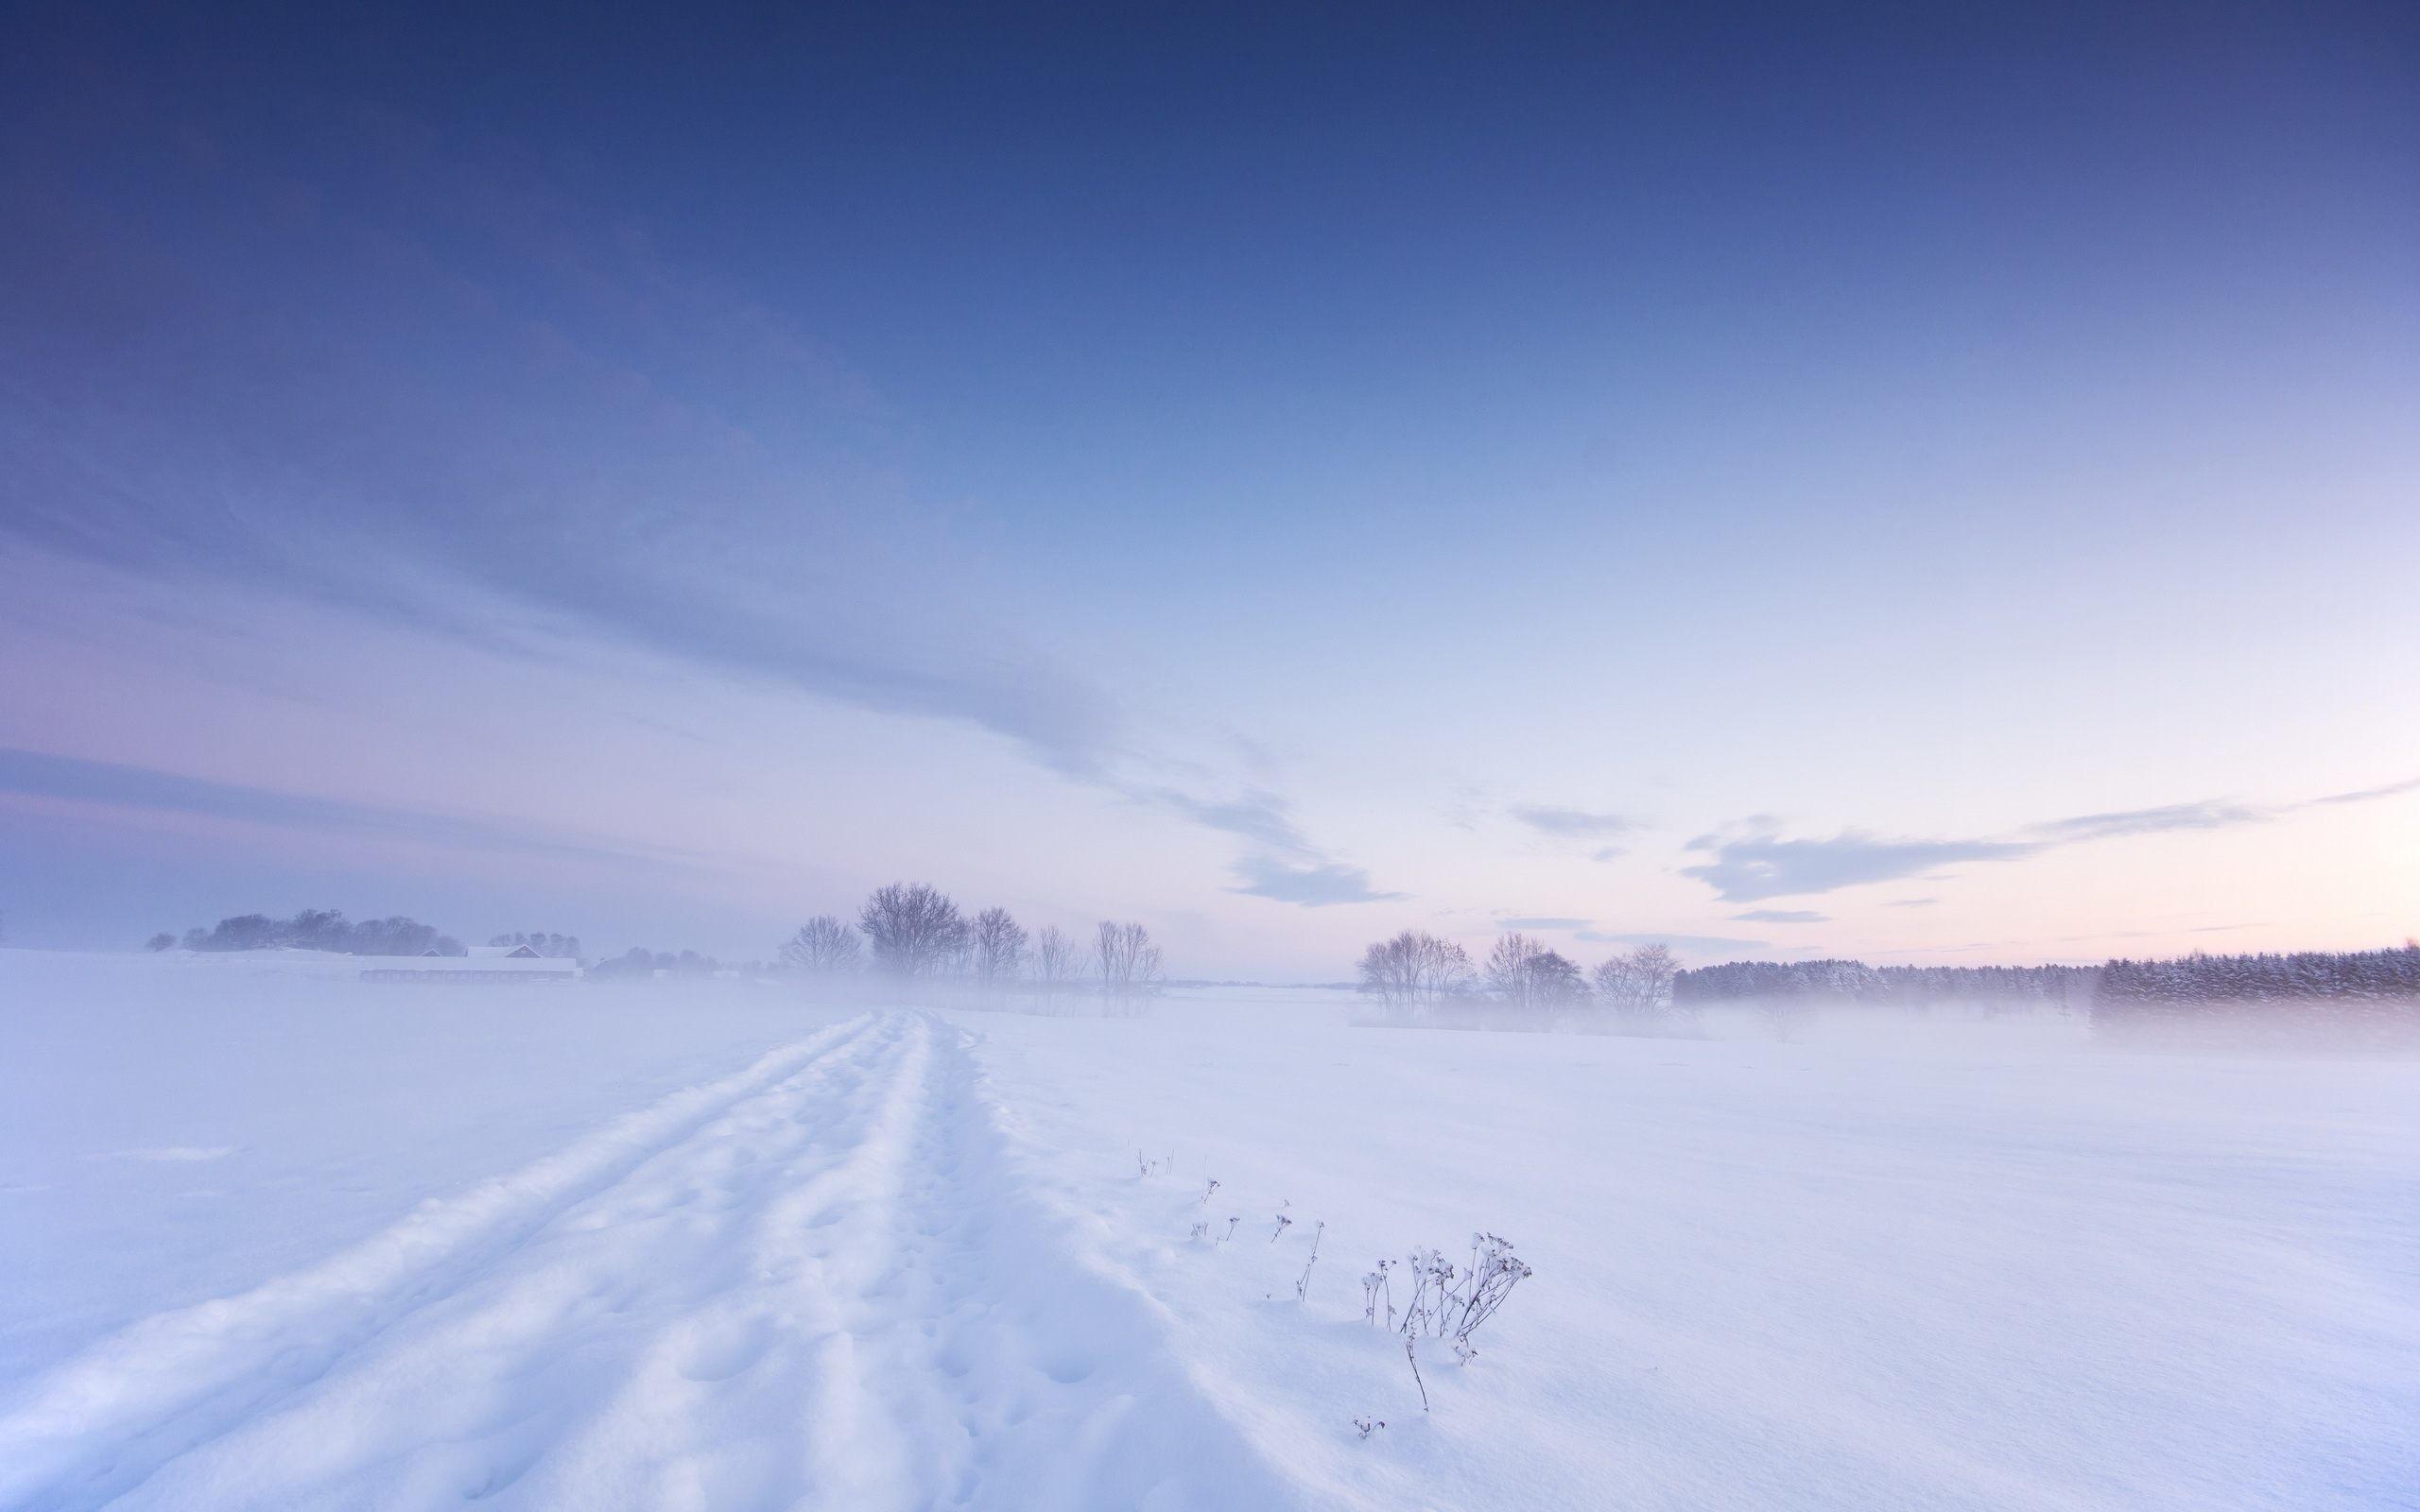 Winter Snow Background Wallpaper